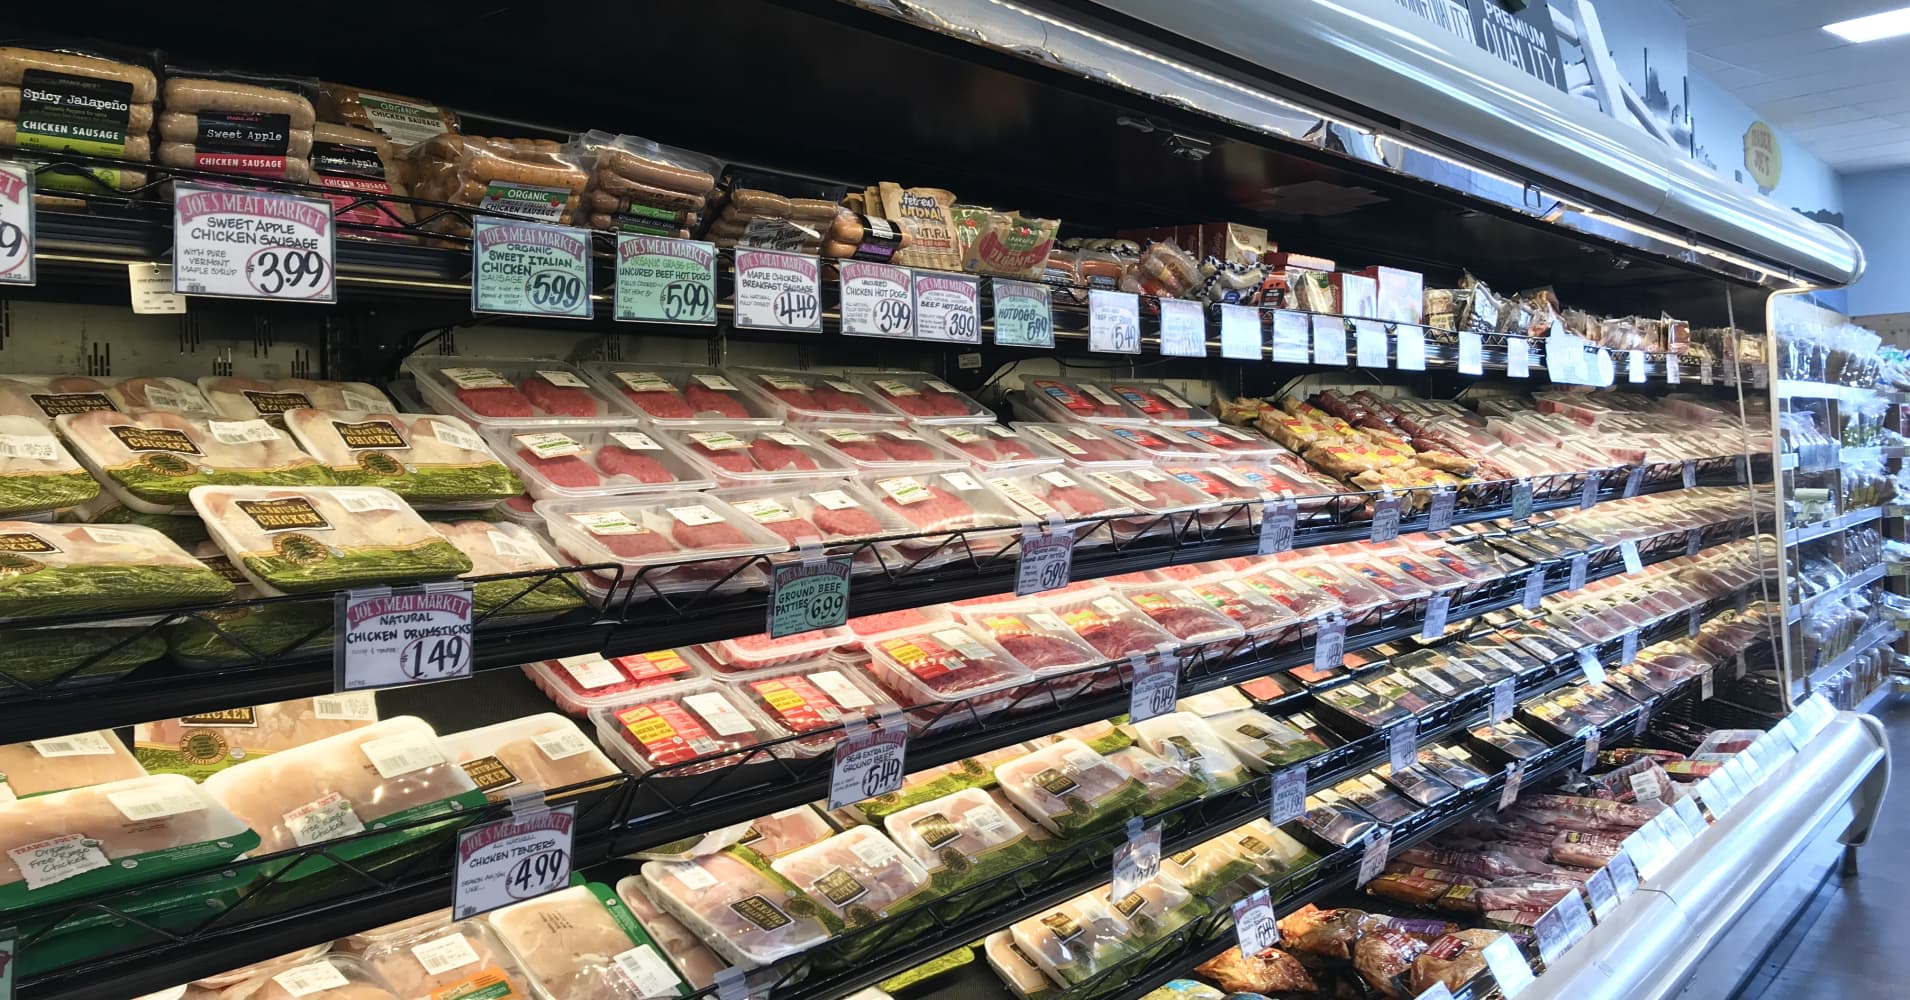 6 foods you should never buy at Trader Joe's